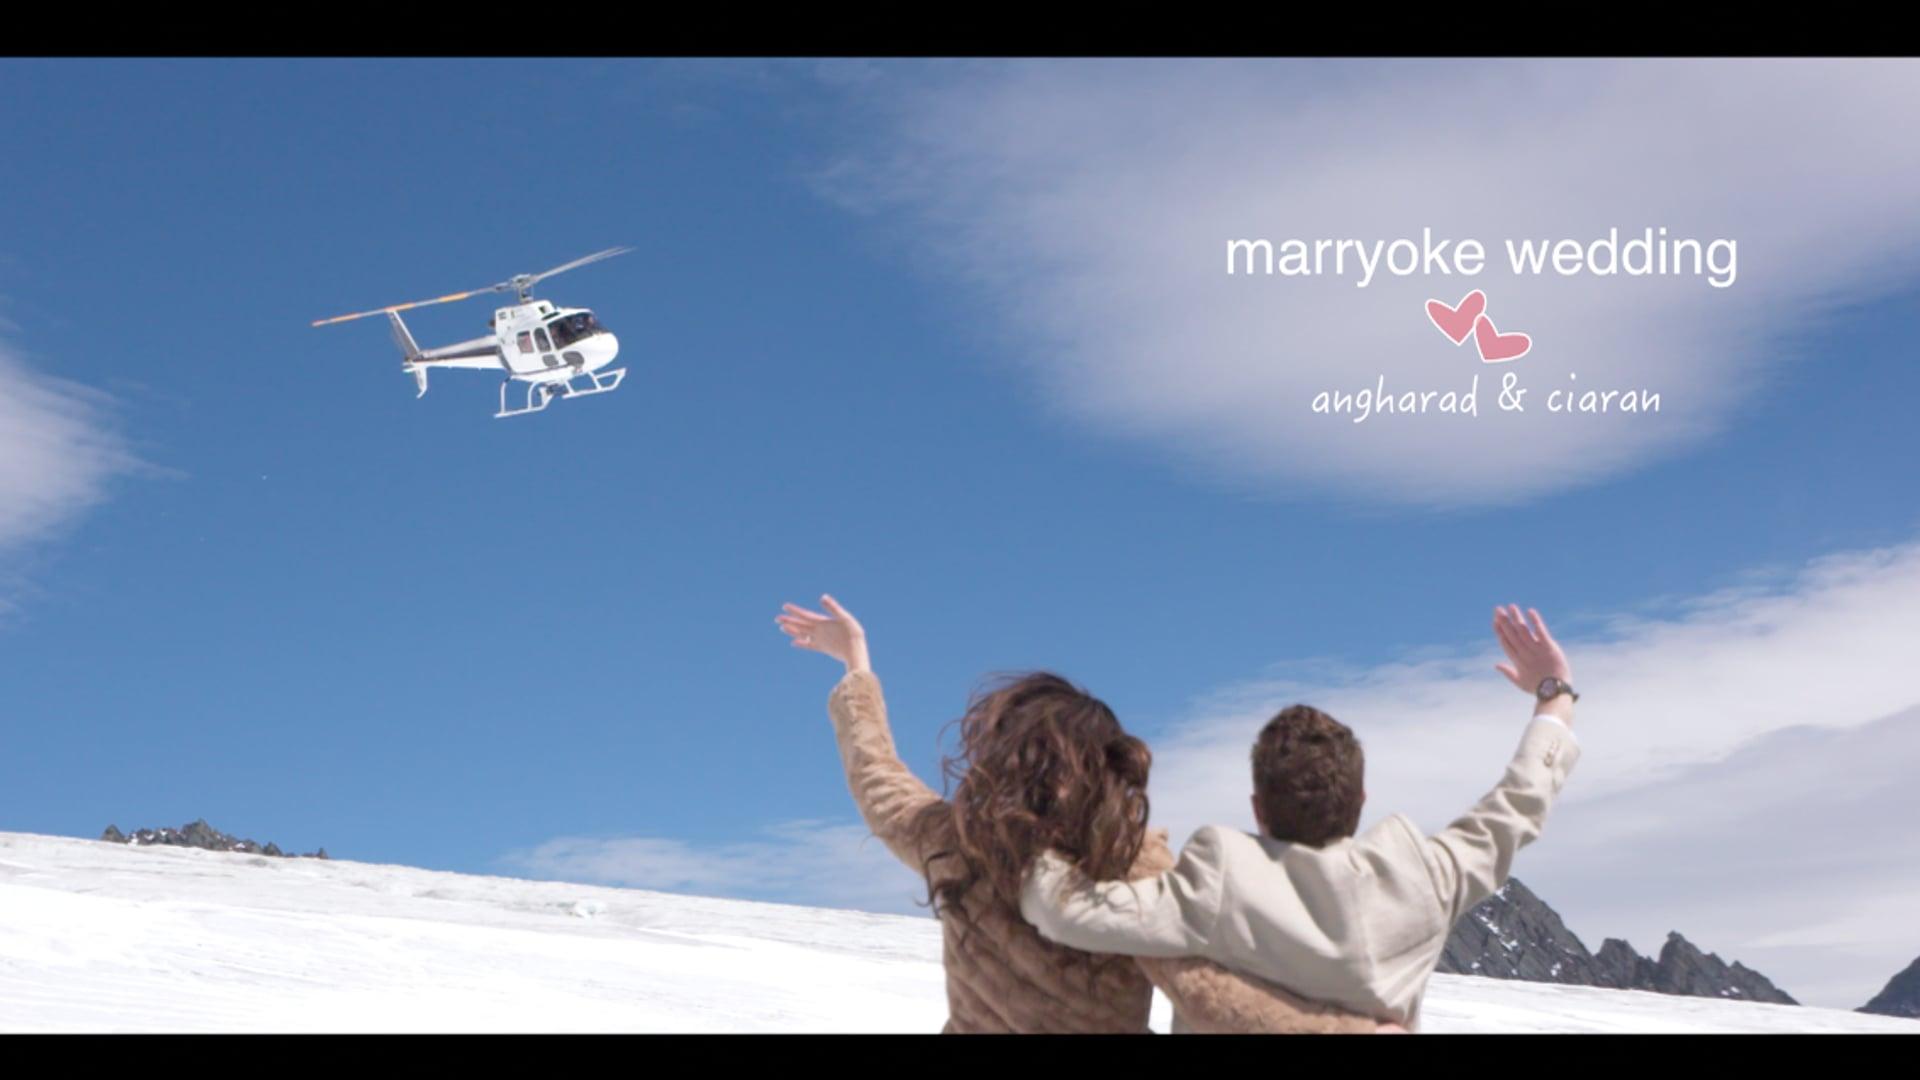 MARRYOKE Wedding   Angharad & Ciaran // New Zealand // Wanaka